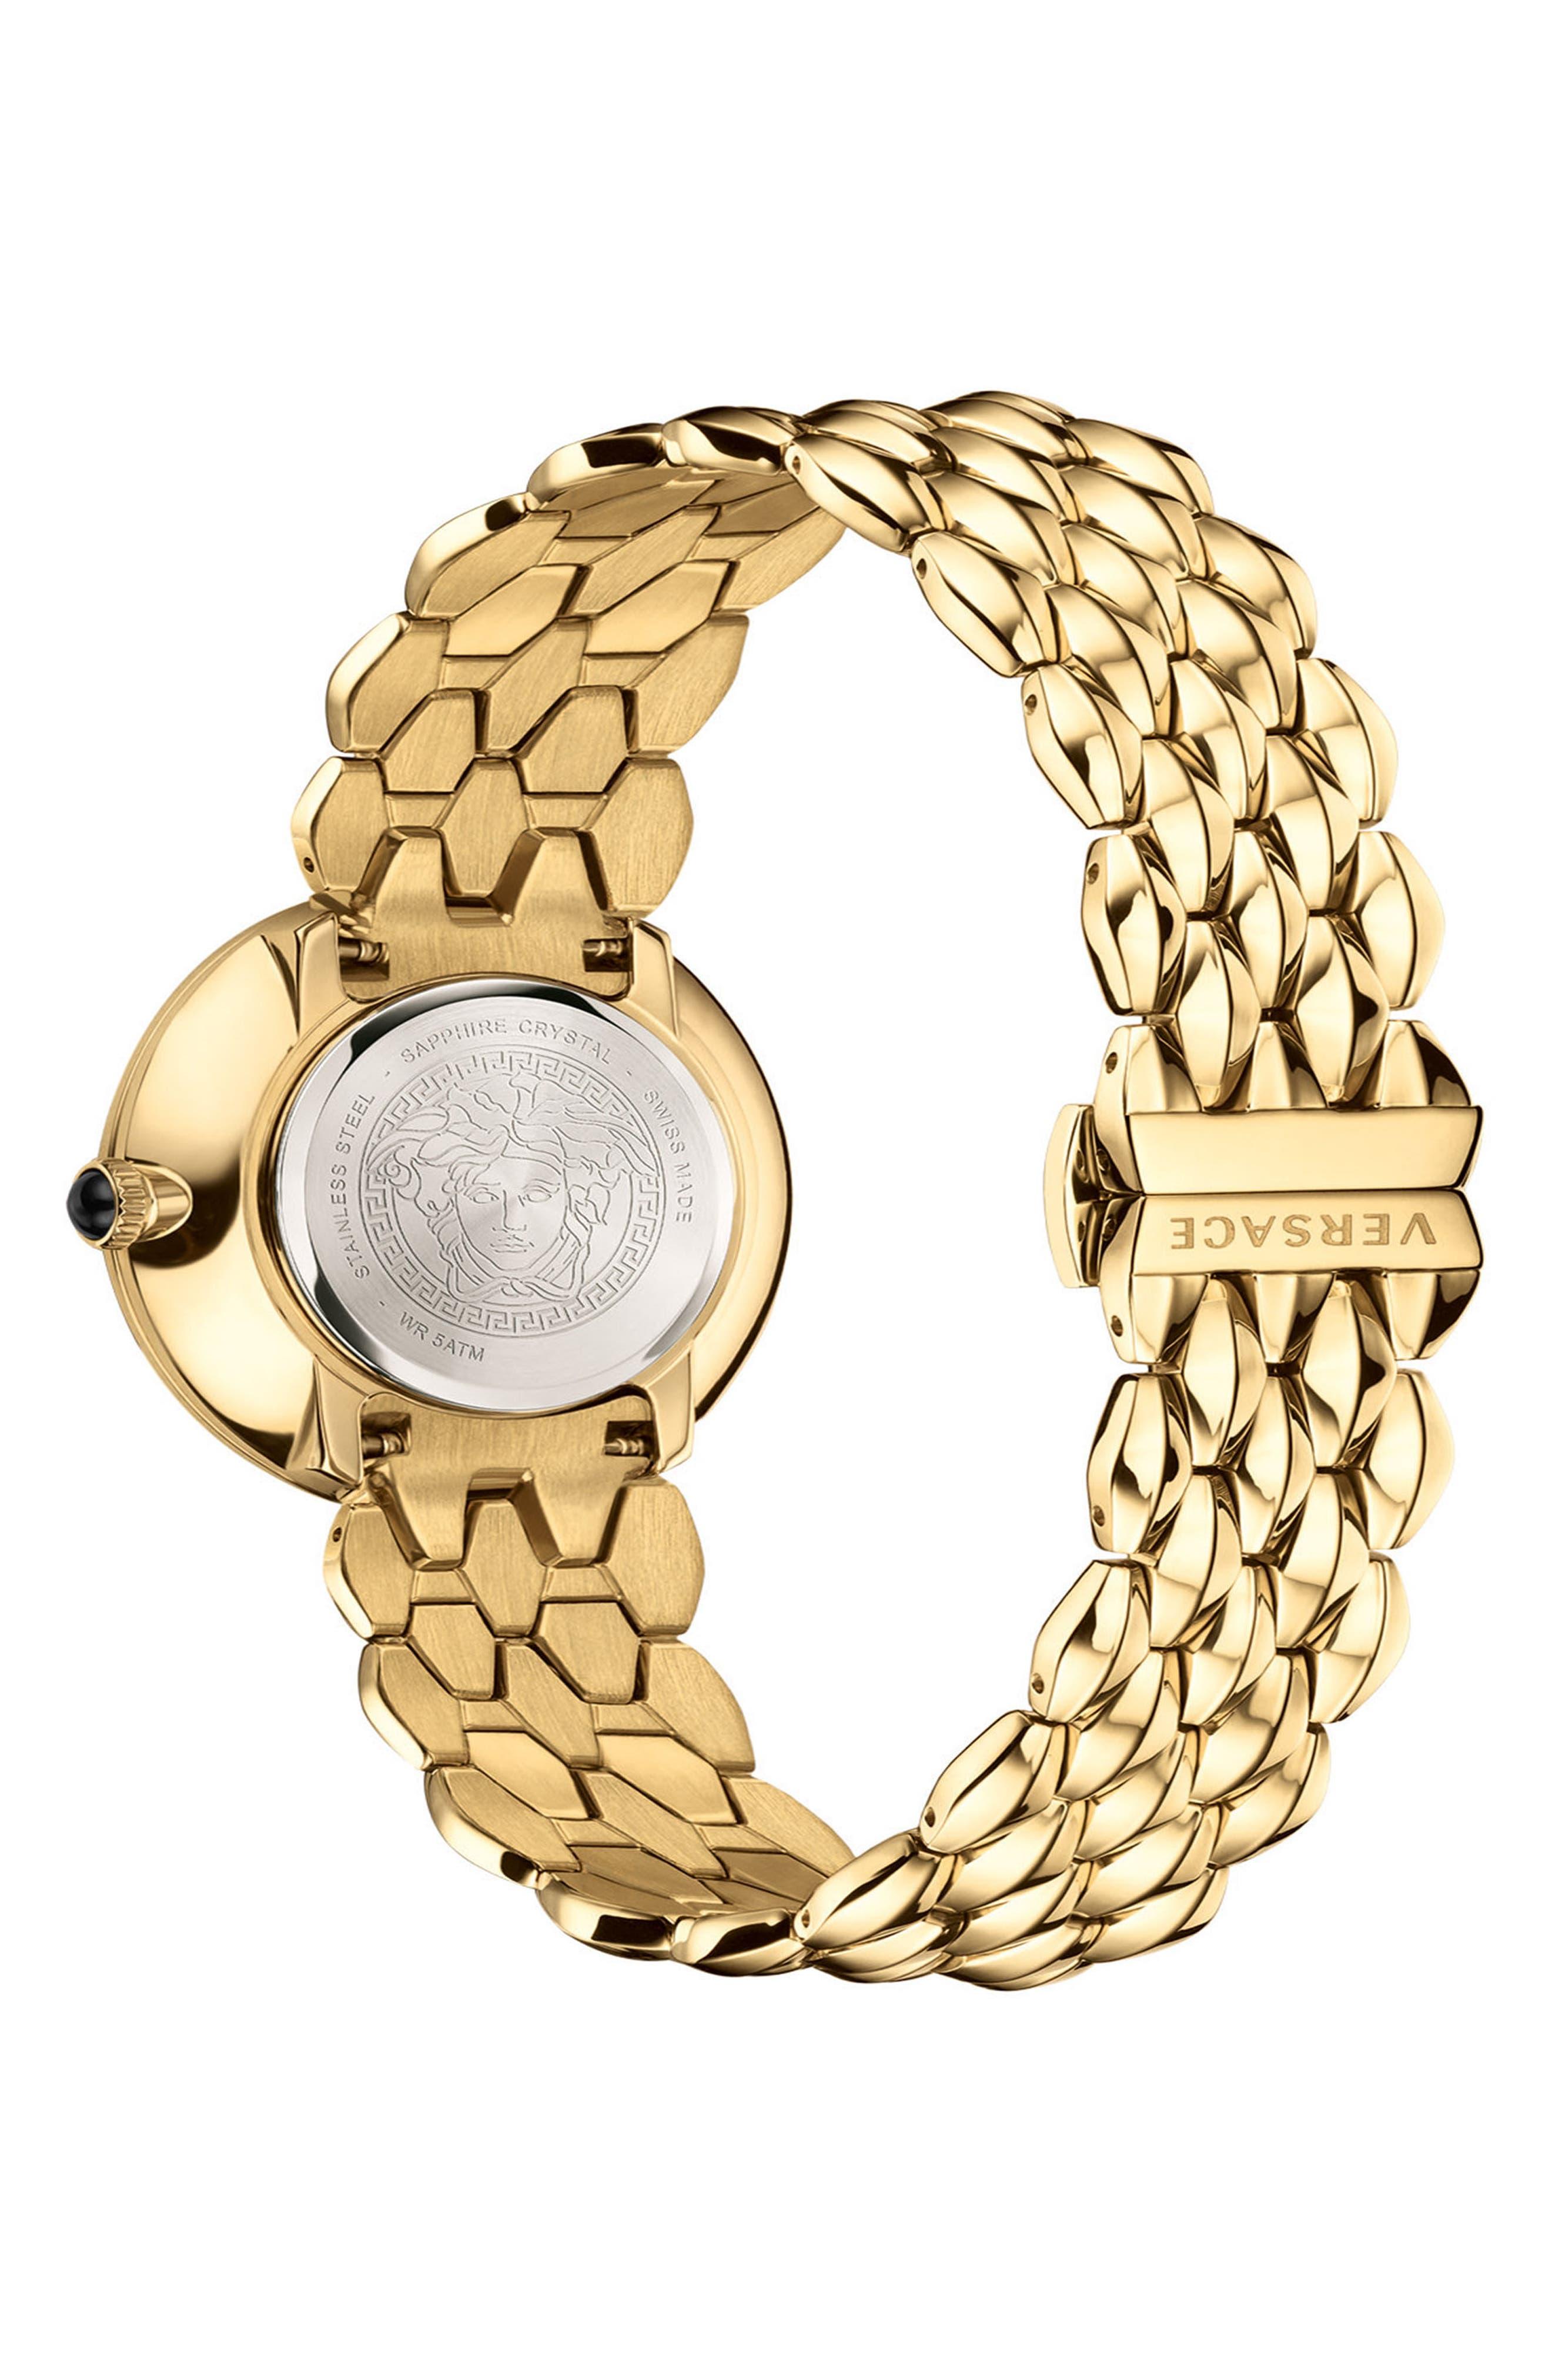 VERSACE, V-Flare Bracelet Watch, 28mm, Alternate thumbnail 2, color, GOLD/ SILVER/ GOLD